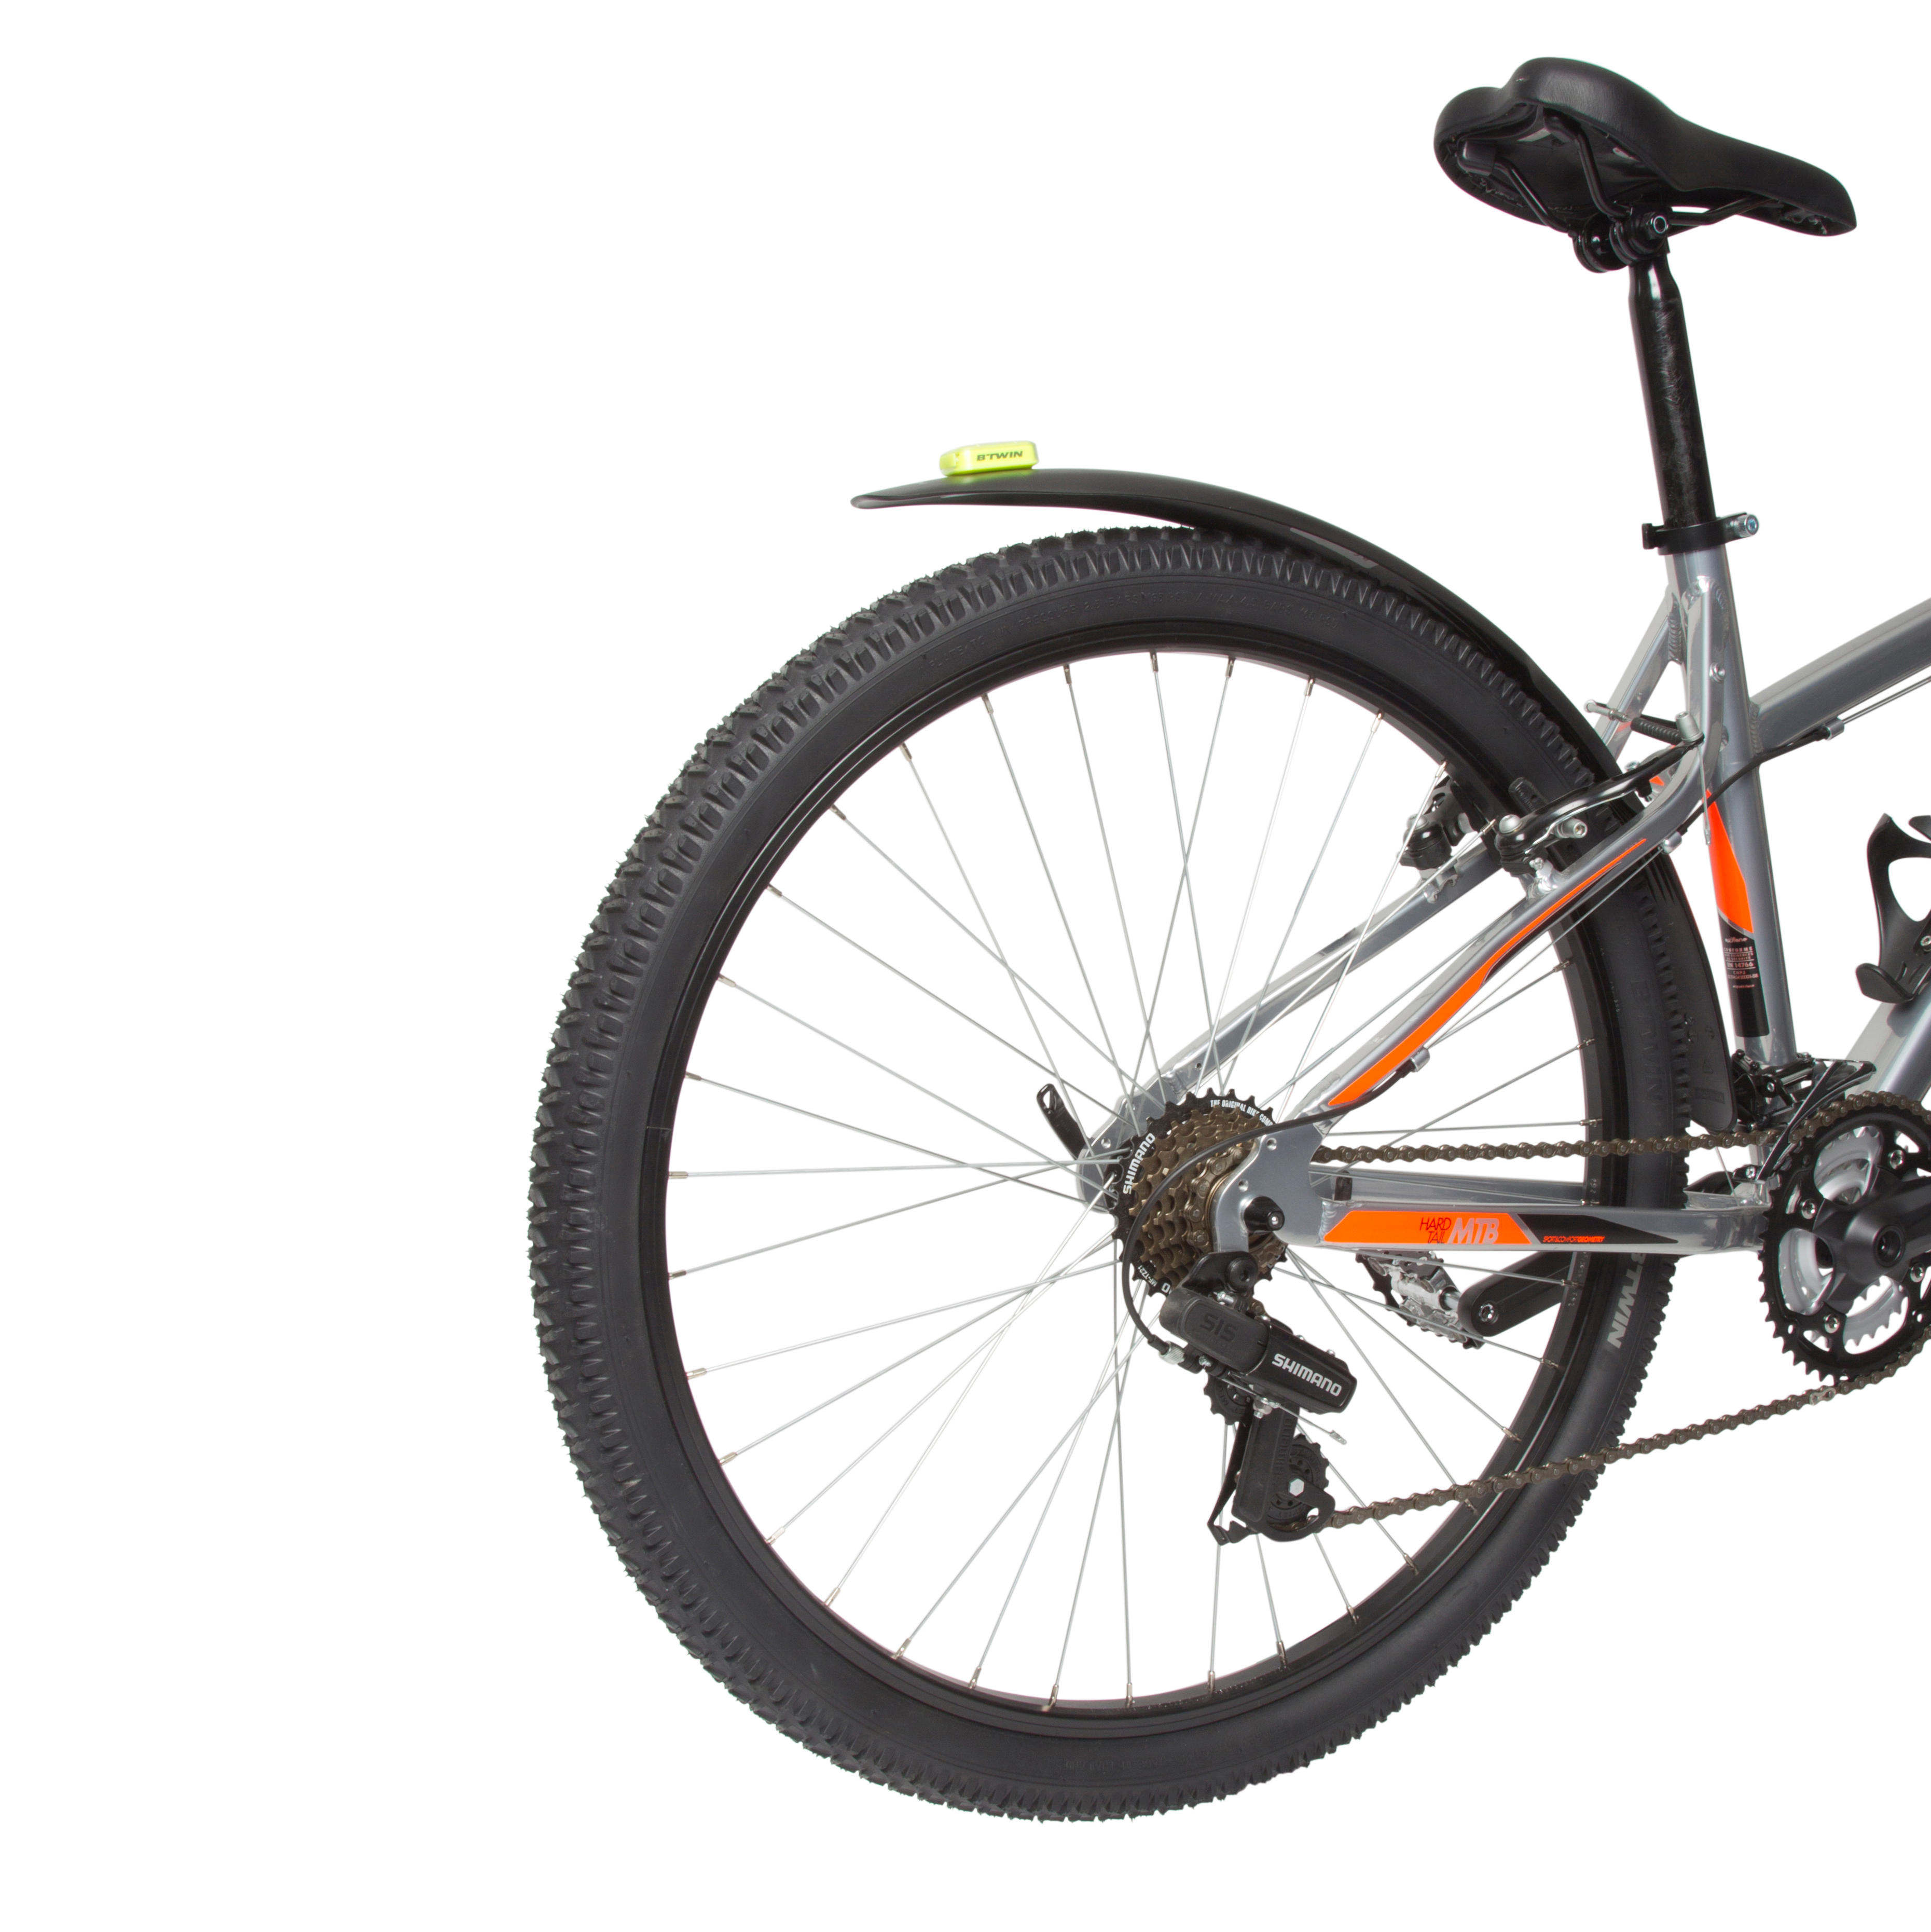 "300 Bike 24""- 28"" Mudguard Kit"